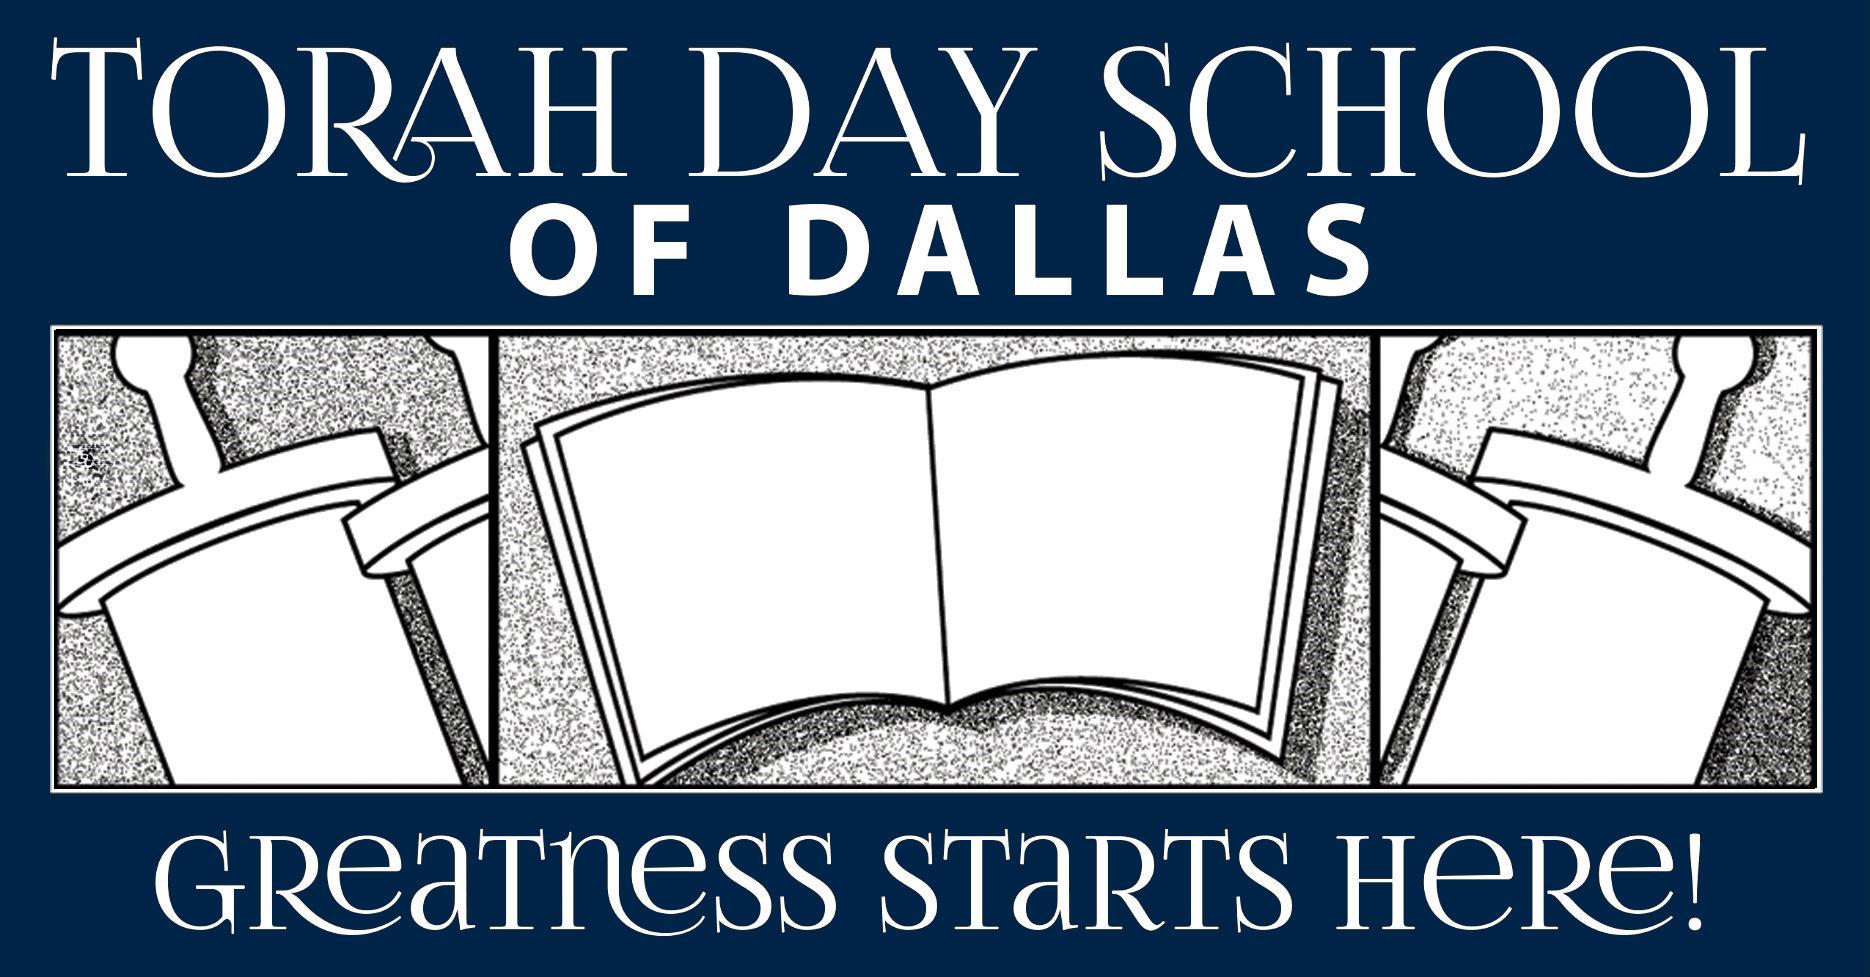 Torah Day School of Dallas | Orthodox Jewish Day School